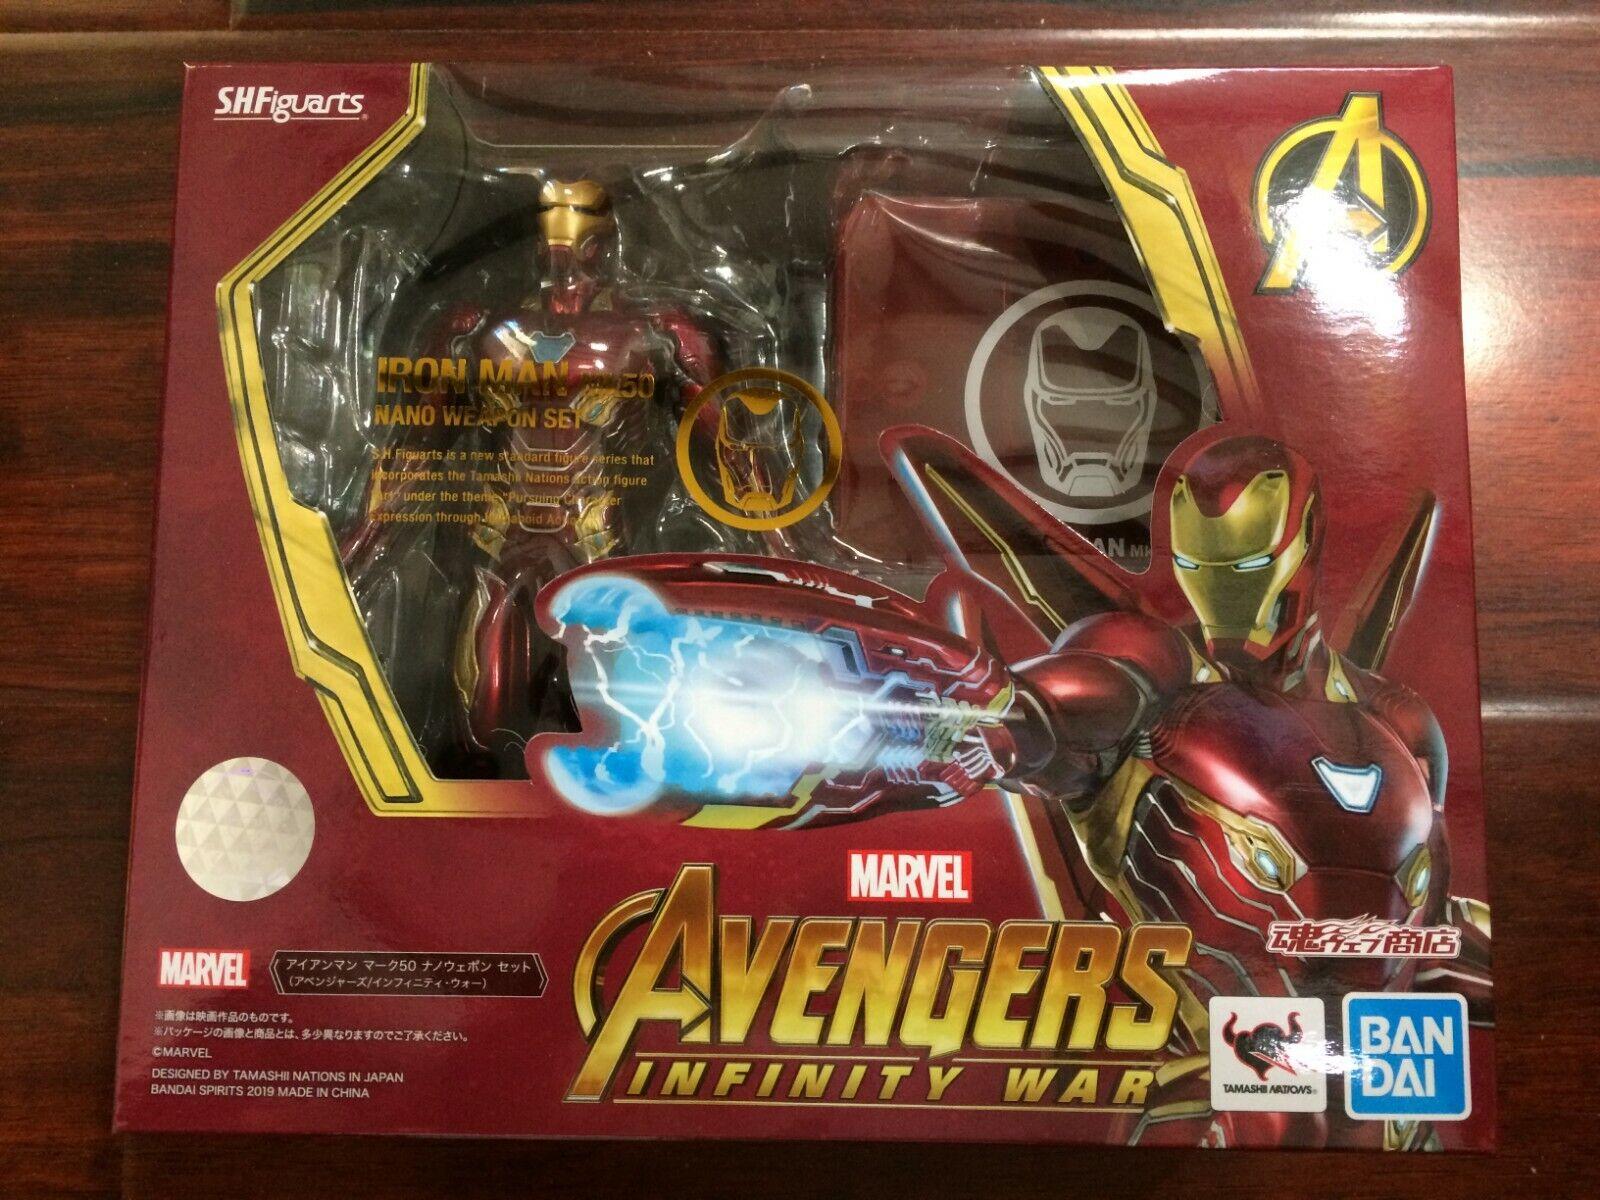 IN HAND  S.H.Figuarts Iron Man Mark 50 Nano Weapon Set Avengers Endgame INFINITY